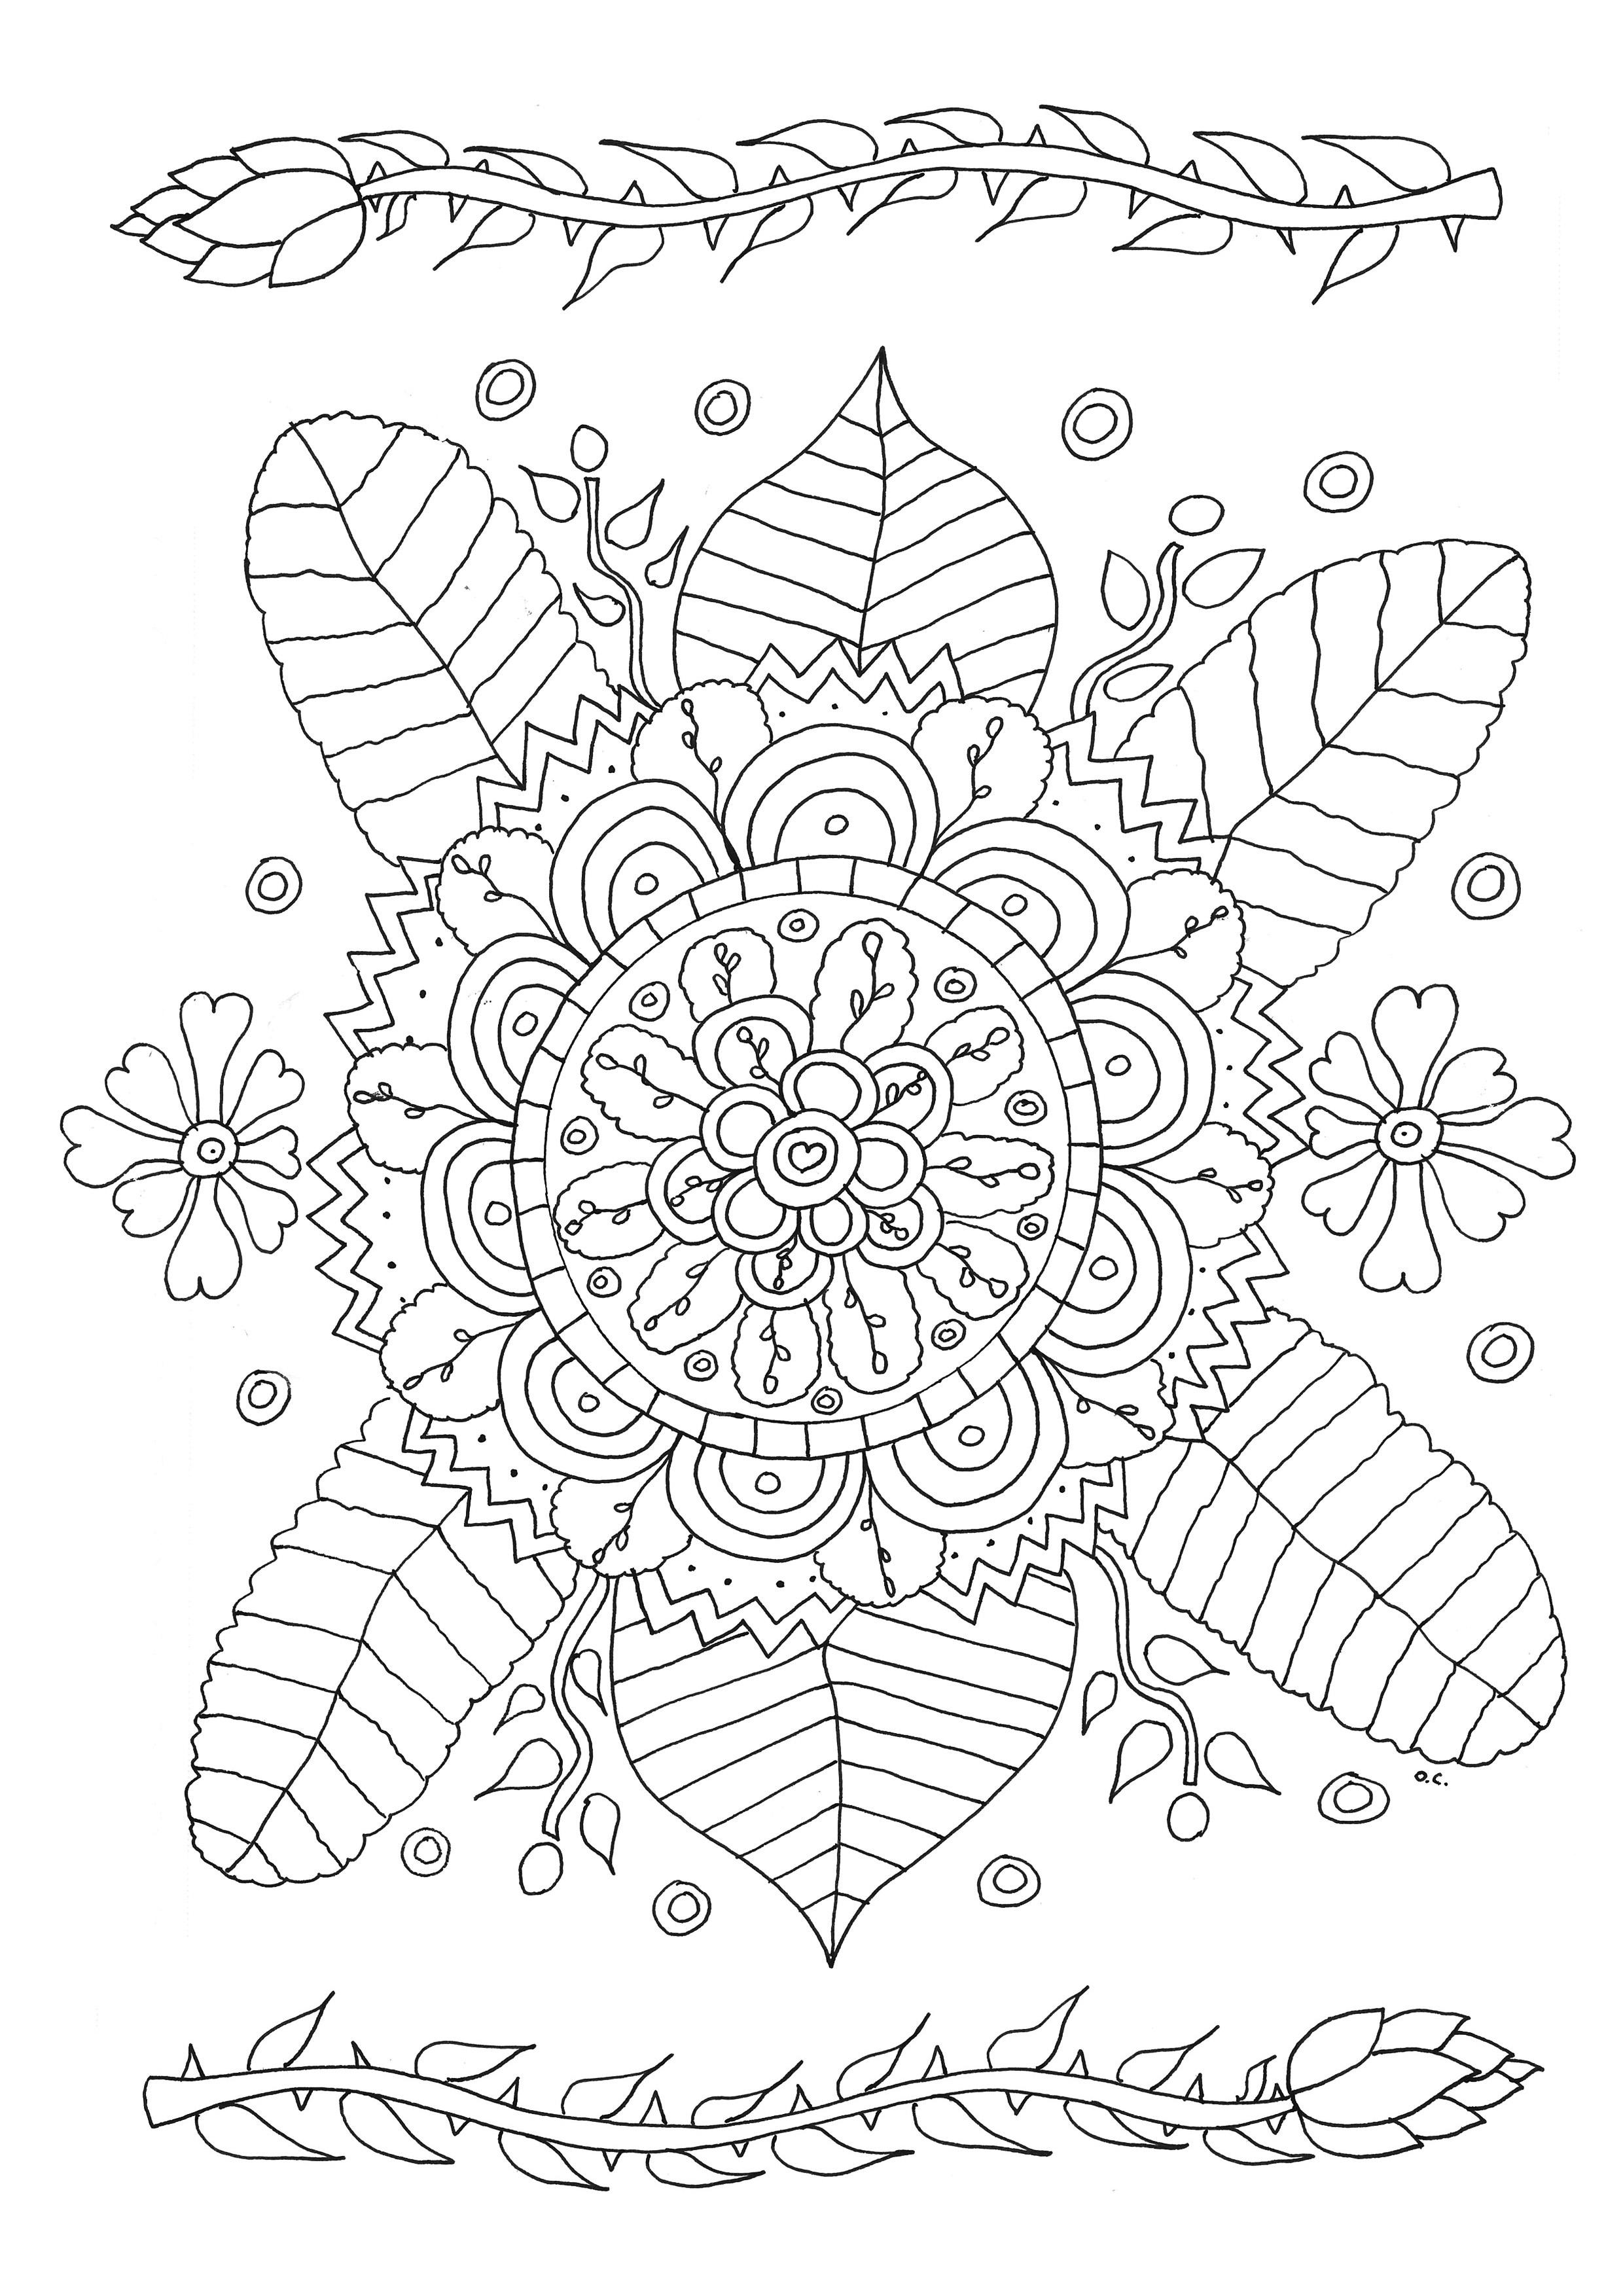 Simple and harmonious flowers